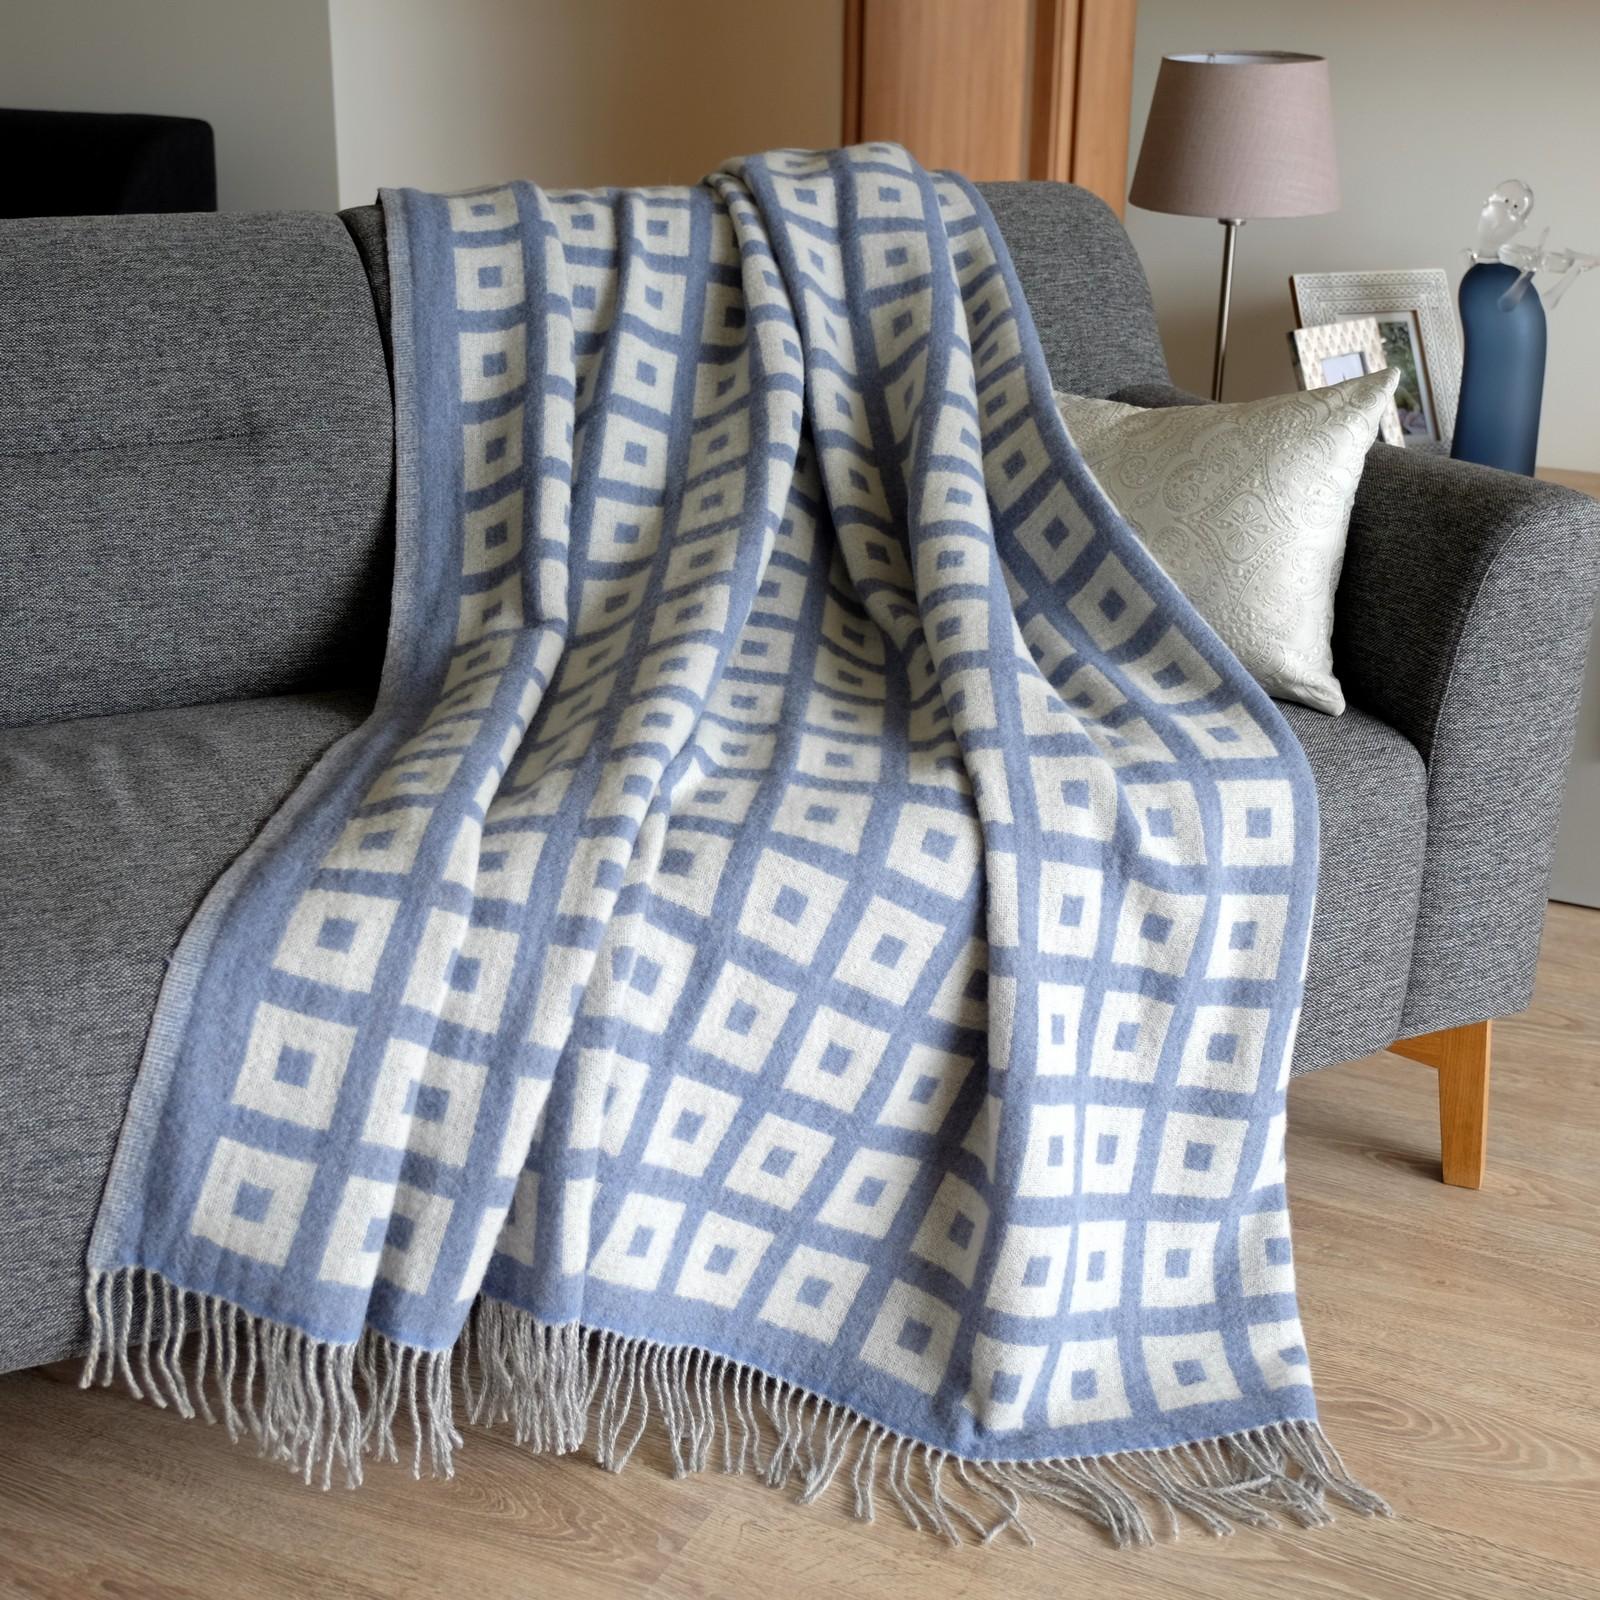 Luxury Extra Soft Sofa Bed Throw Blanket Rome 100